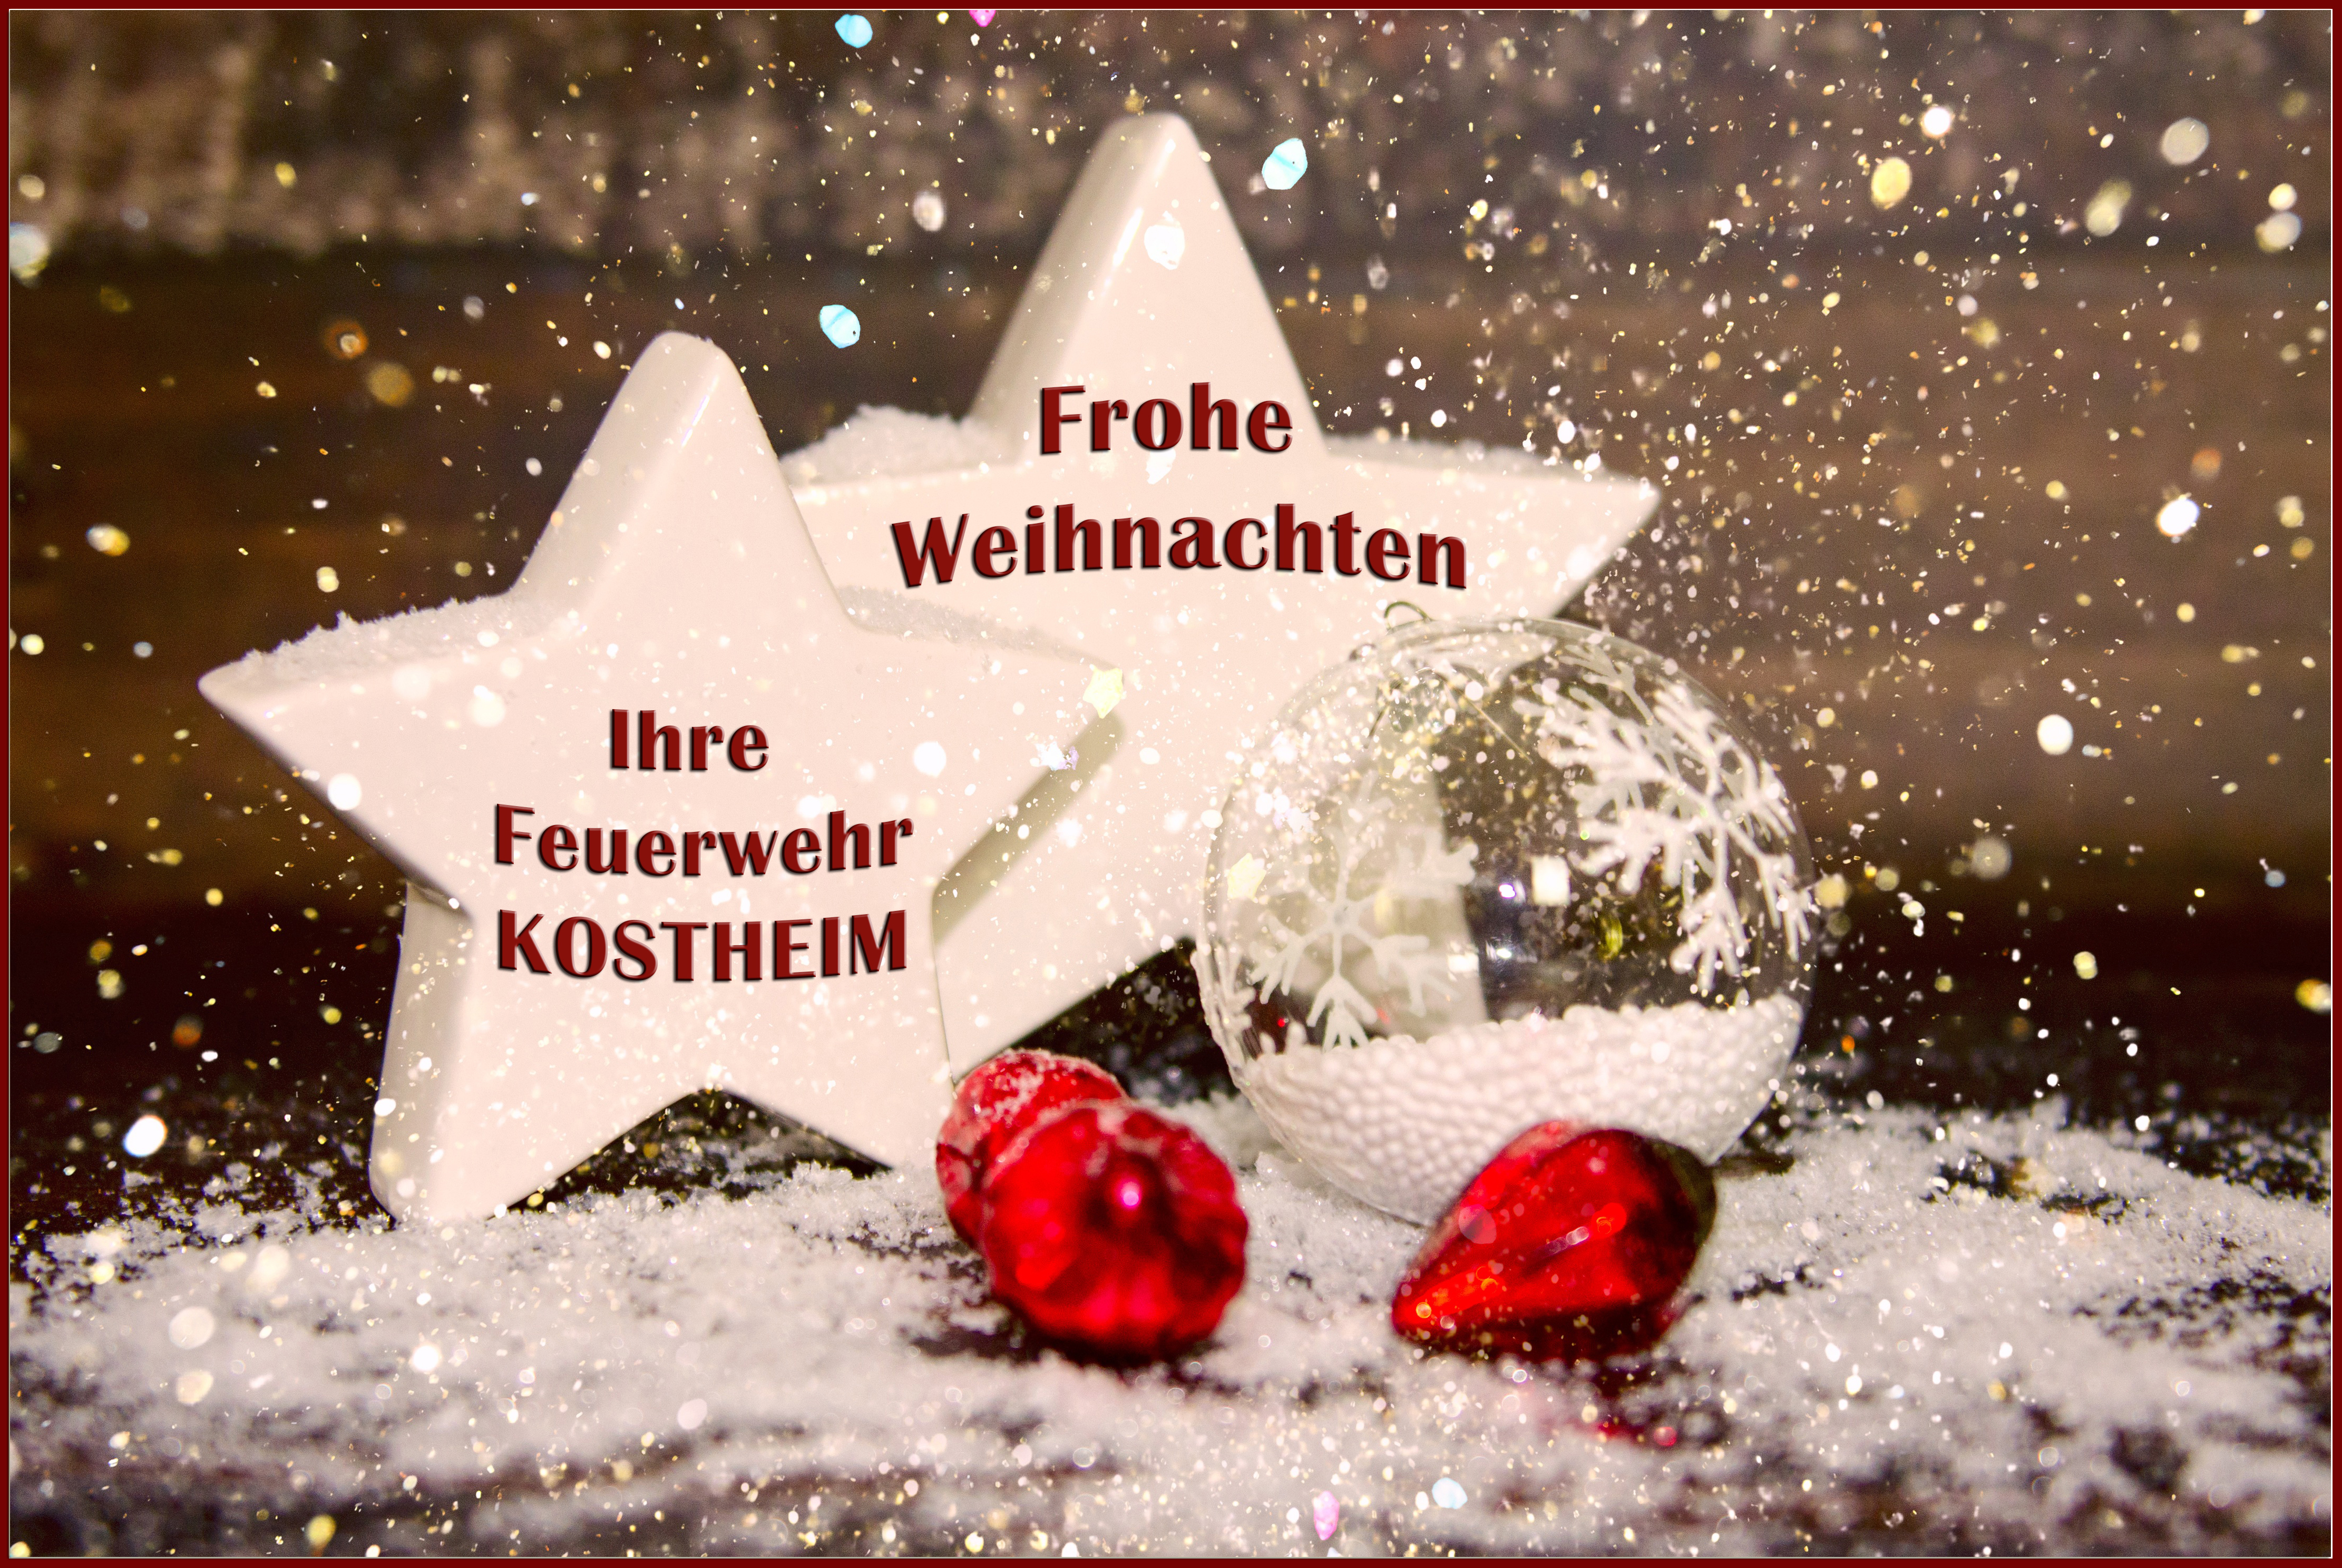 Ho Ho Ho Frohe Weihnachten.Ho Ho Ho Freiwillige Feuerwehr Mainz Kostheim 1874 E V